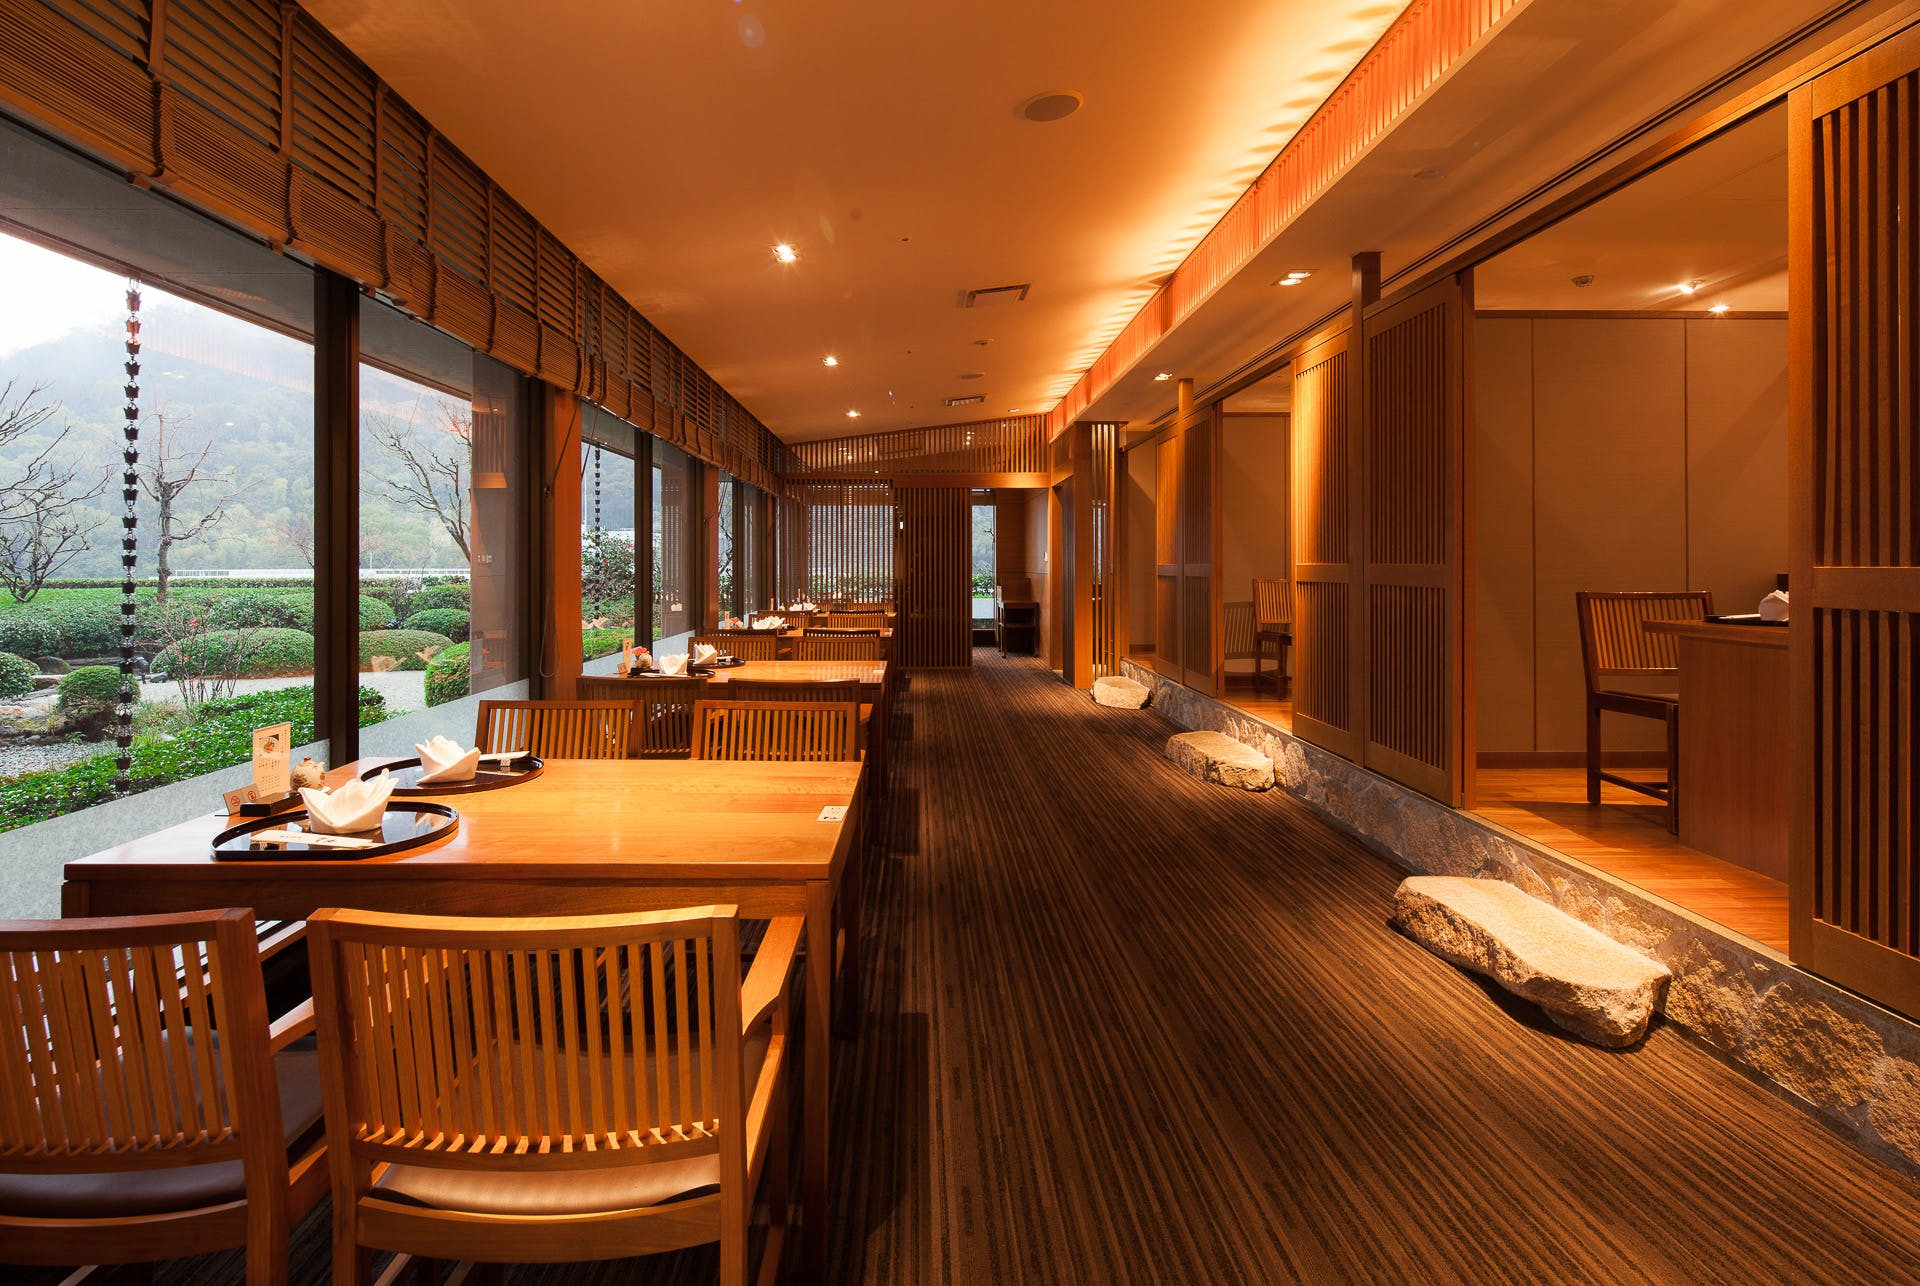 日本料理 雲海/松山全日空ホテル